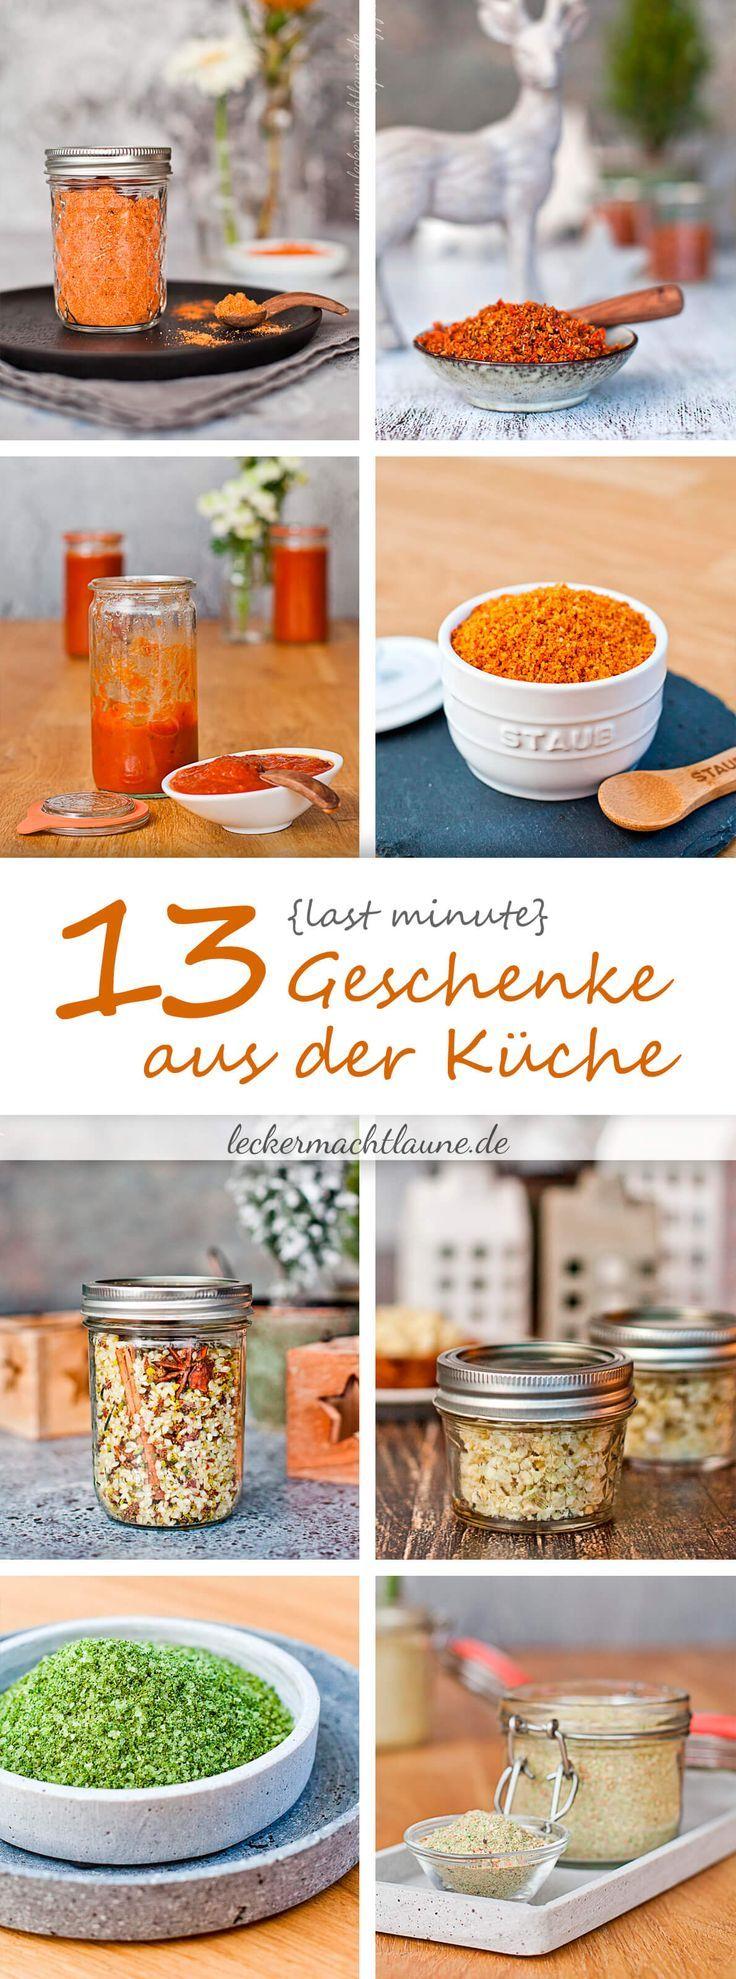 13 Last Minute Geschenke aus der Küche – StudioStories.de | Content Creator & Pinfluencer | Fotografie & DIY